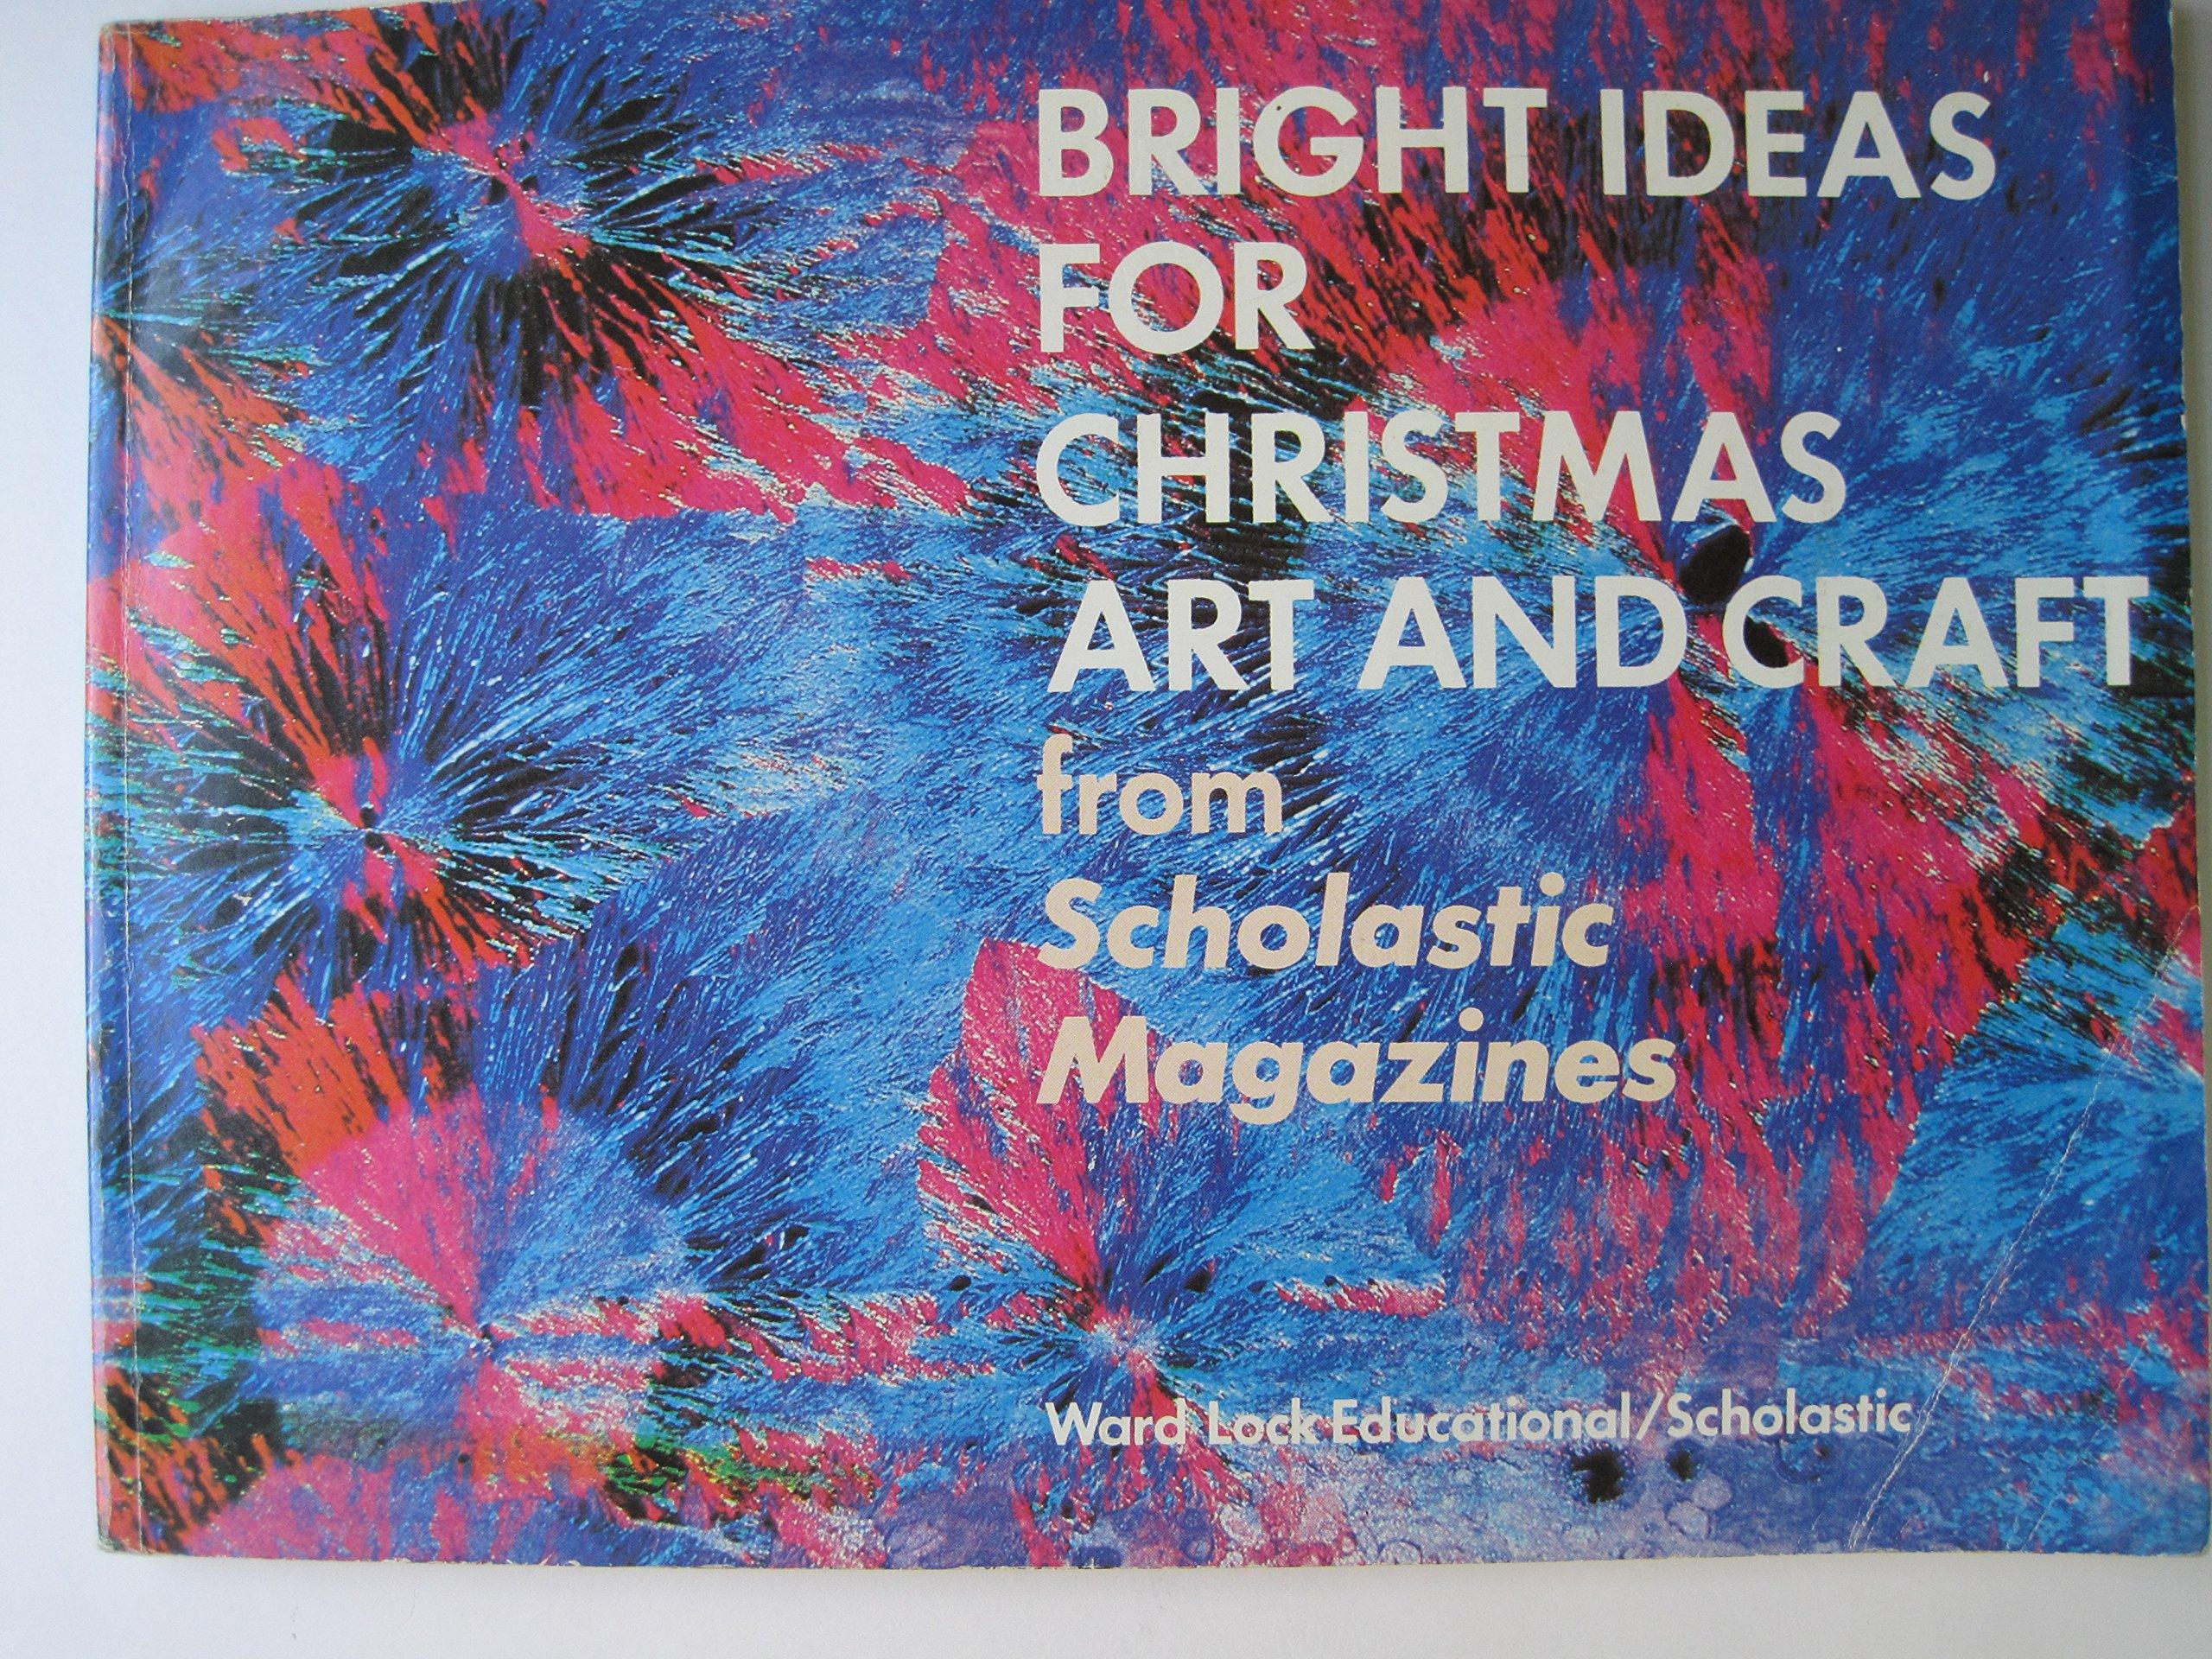 bright ideas for christmas art and craft bright ideas books dean audrey vincente vincente dean audrey 9780706244540 amazon com books amazon com